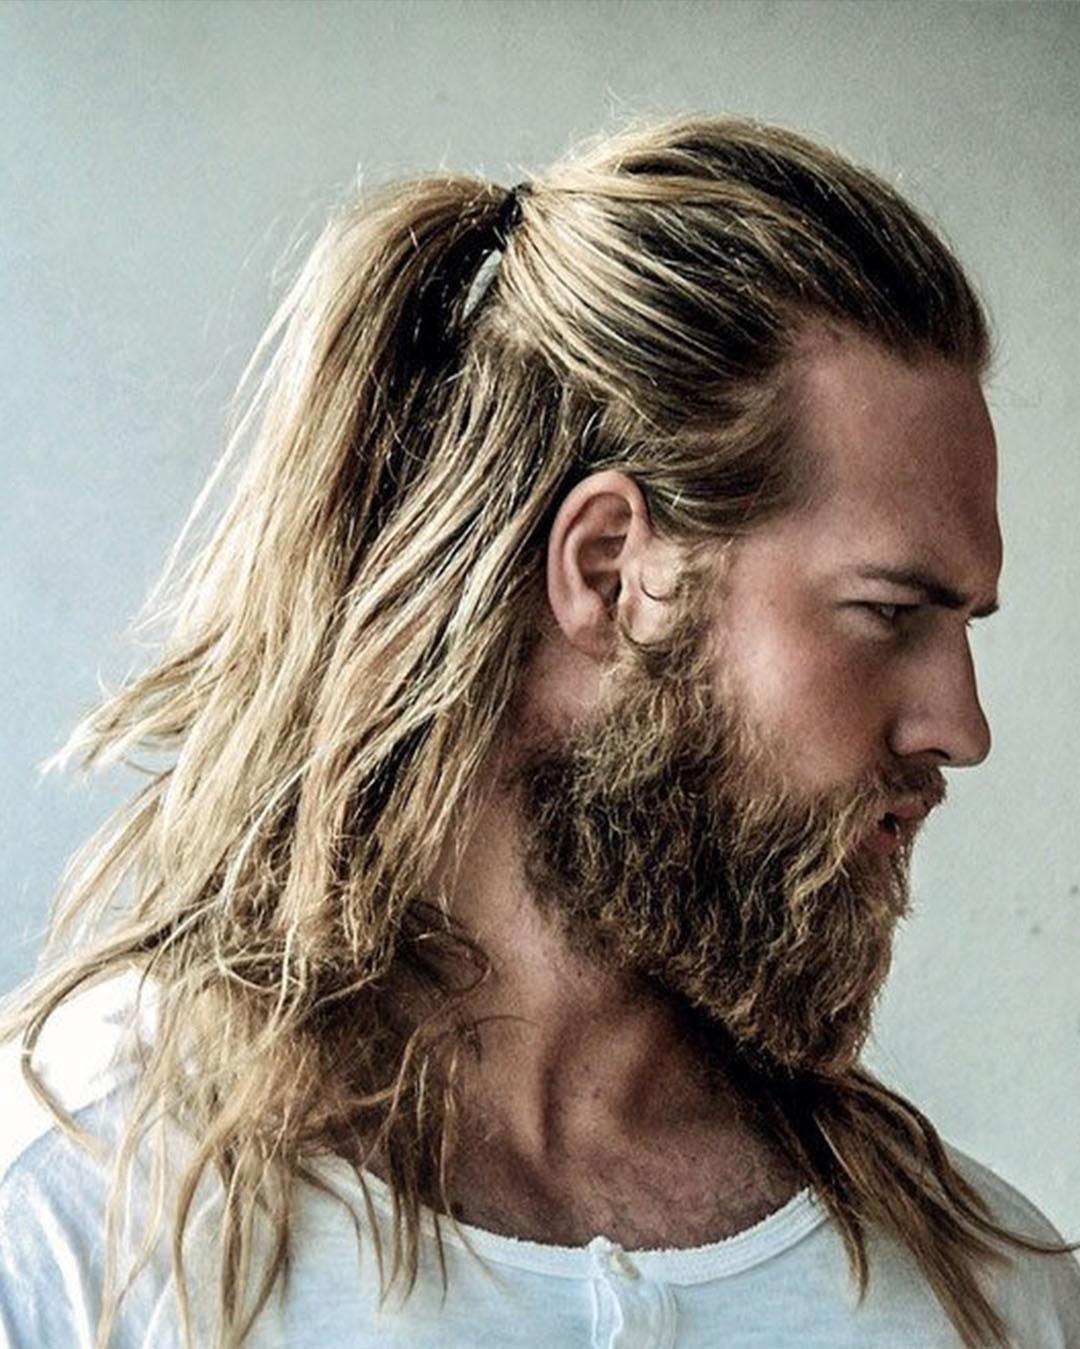 Formas de moda también peinados pelo largo hombre Fotos de cortes de pelo Consejos - Peinados para cabello LARGO hombres que no CONOCÍAS - ElSexoso